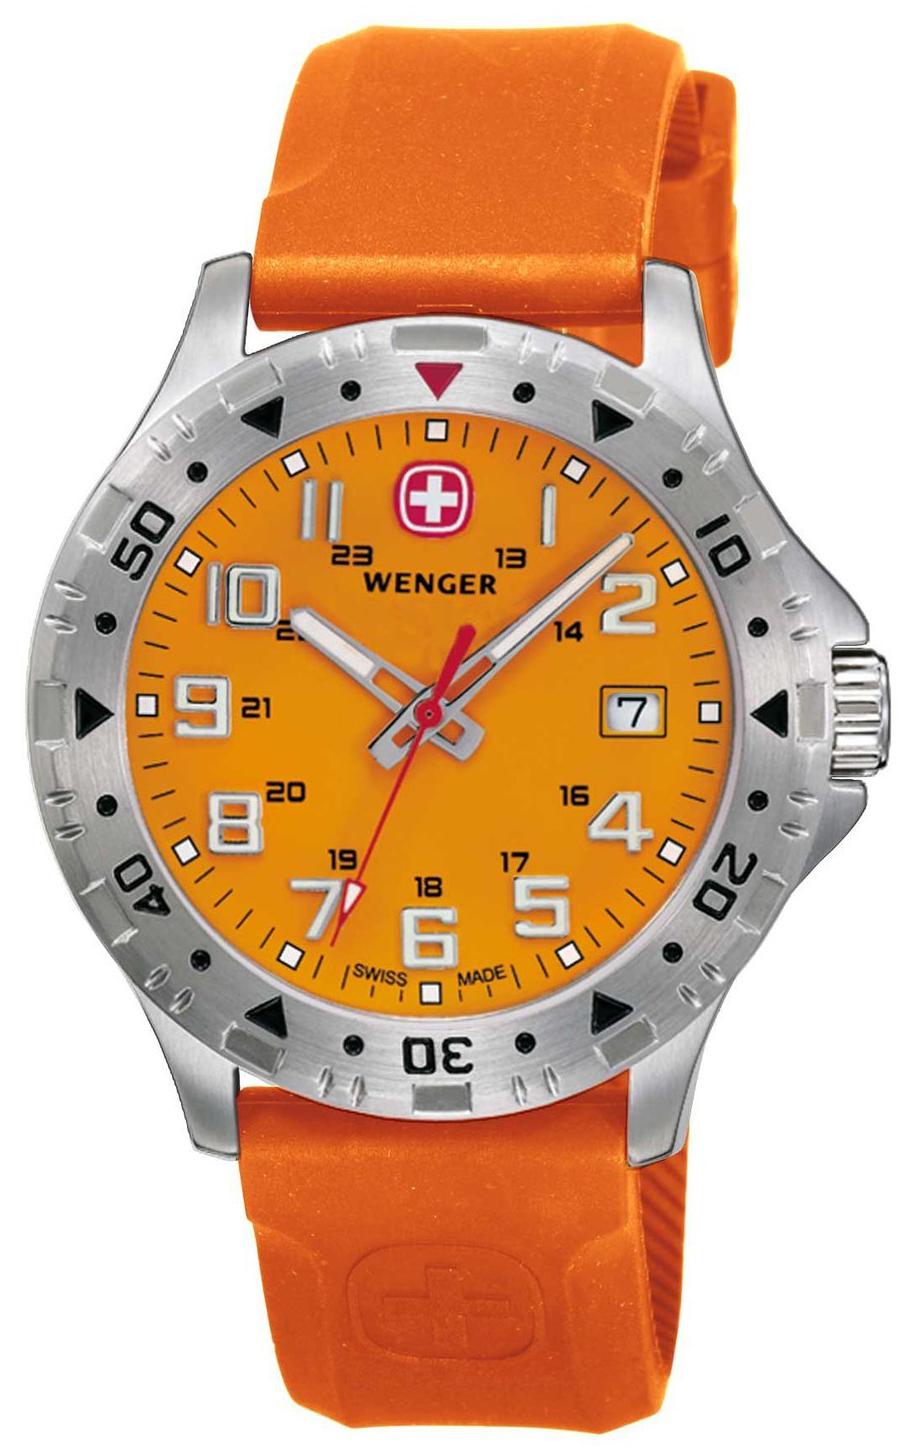 Wenger 99999 Herrklocka 79303W Orange/Gummi Ø40 mm - Wenger